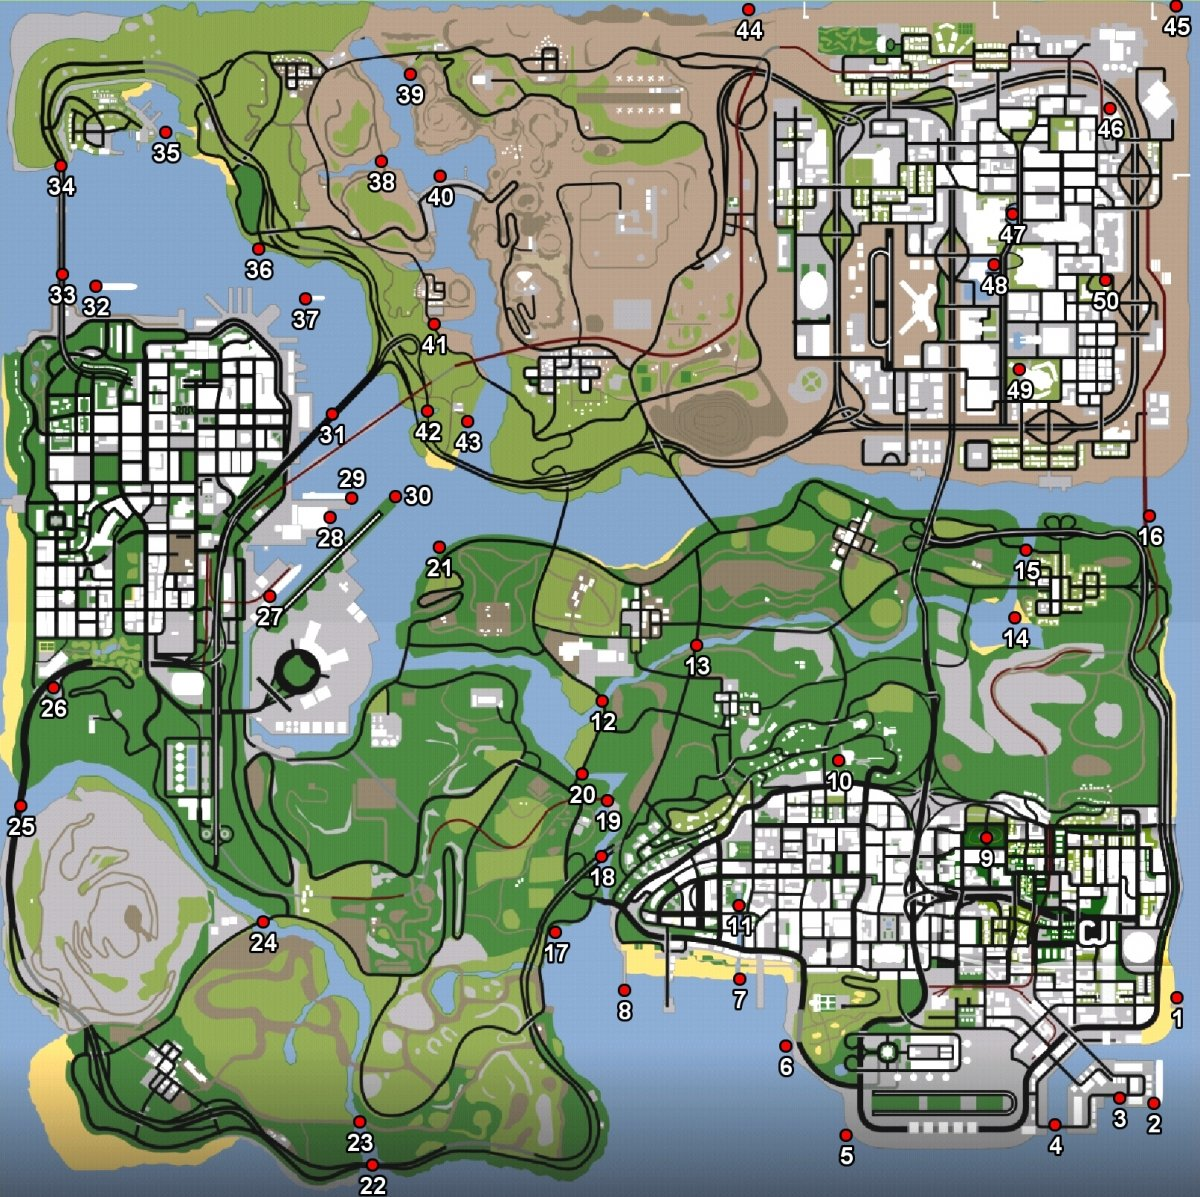 Mapa de ostras en GTA San Andreas